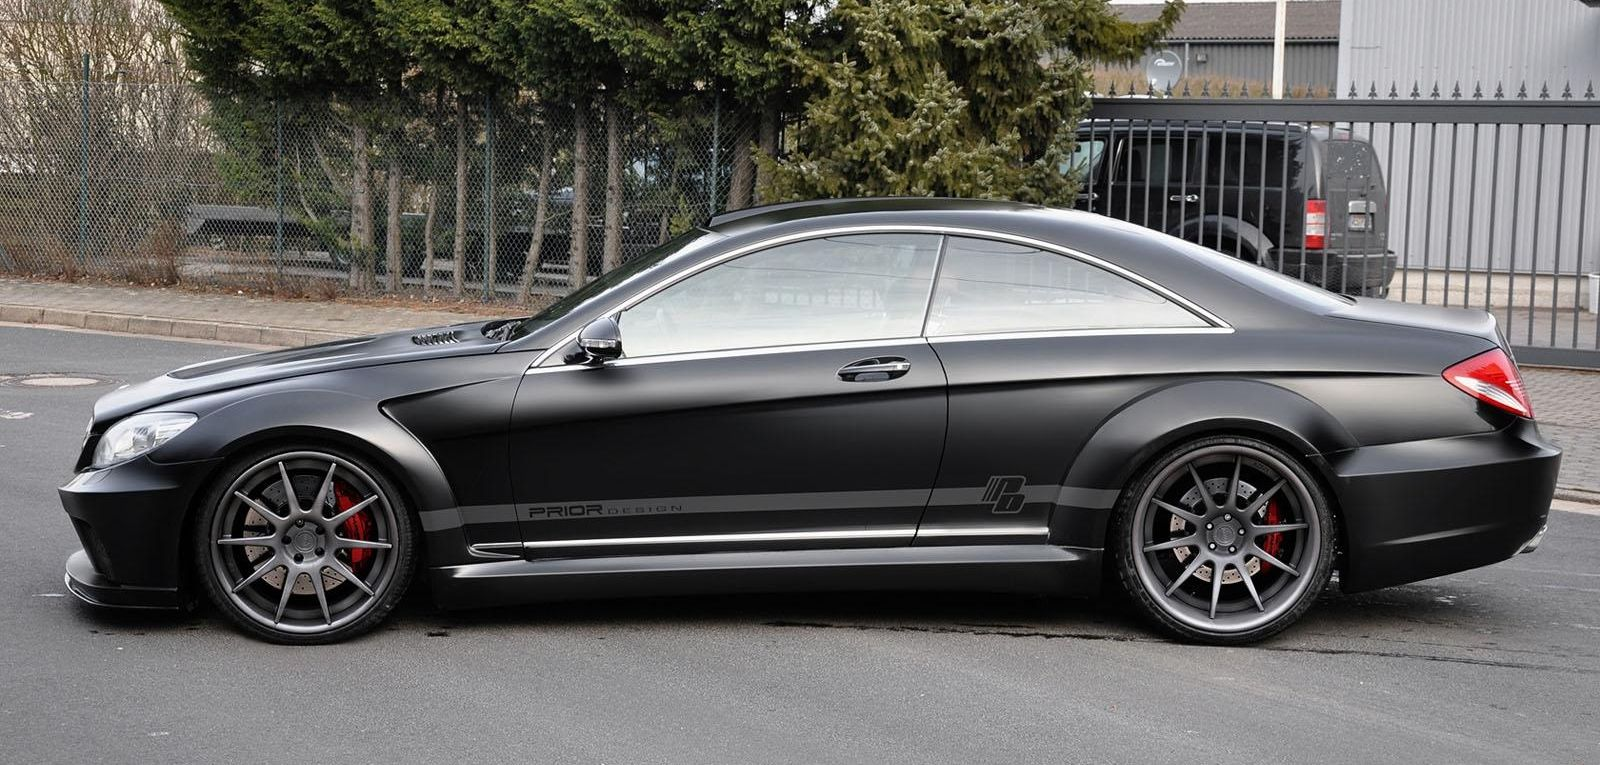 world otomotif mercedes benz cl 500 w216 black edition. Black Bedroom Furniture Sets. Home Design Ideas